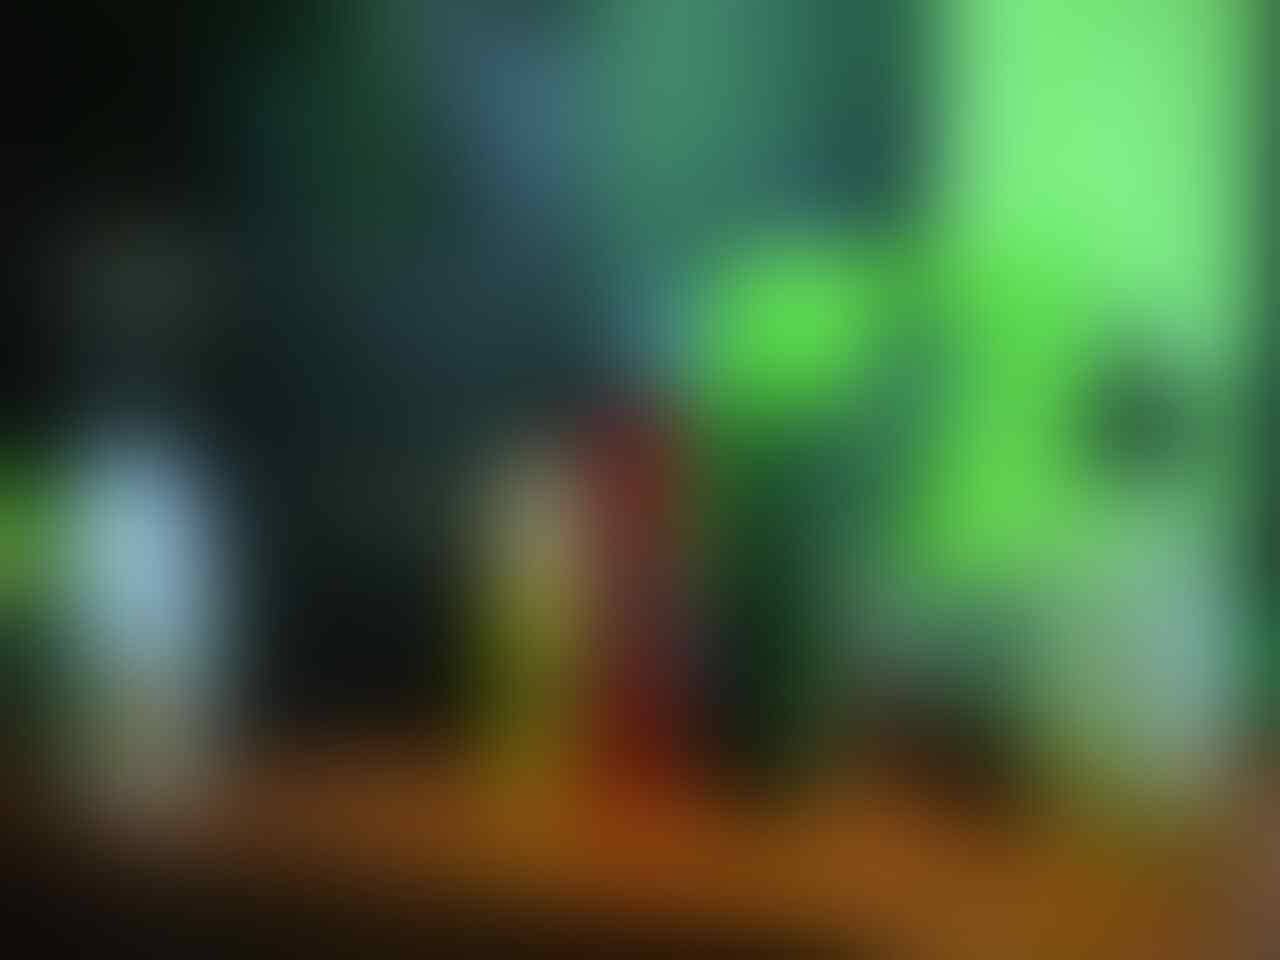 [LOUNGE] PODS - CLOSED SYSTEM - MTL (review, diskusi, pamer, masuk sini!) - Part 2